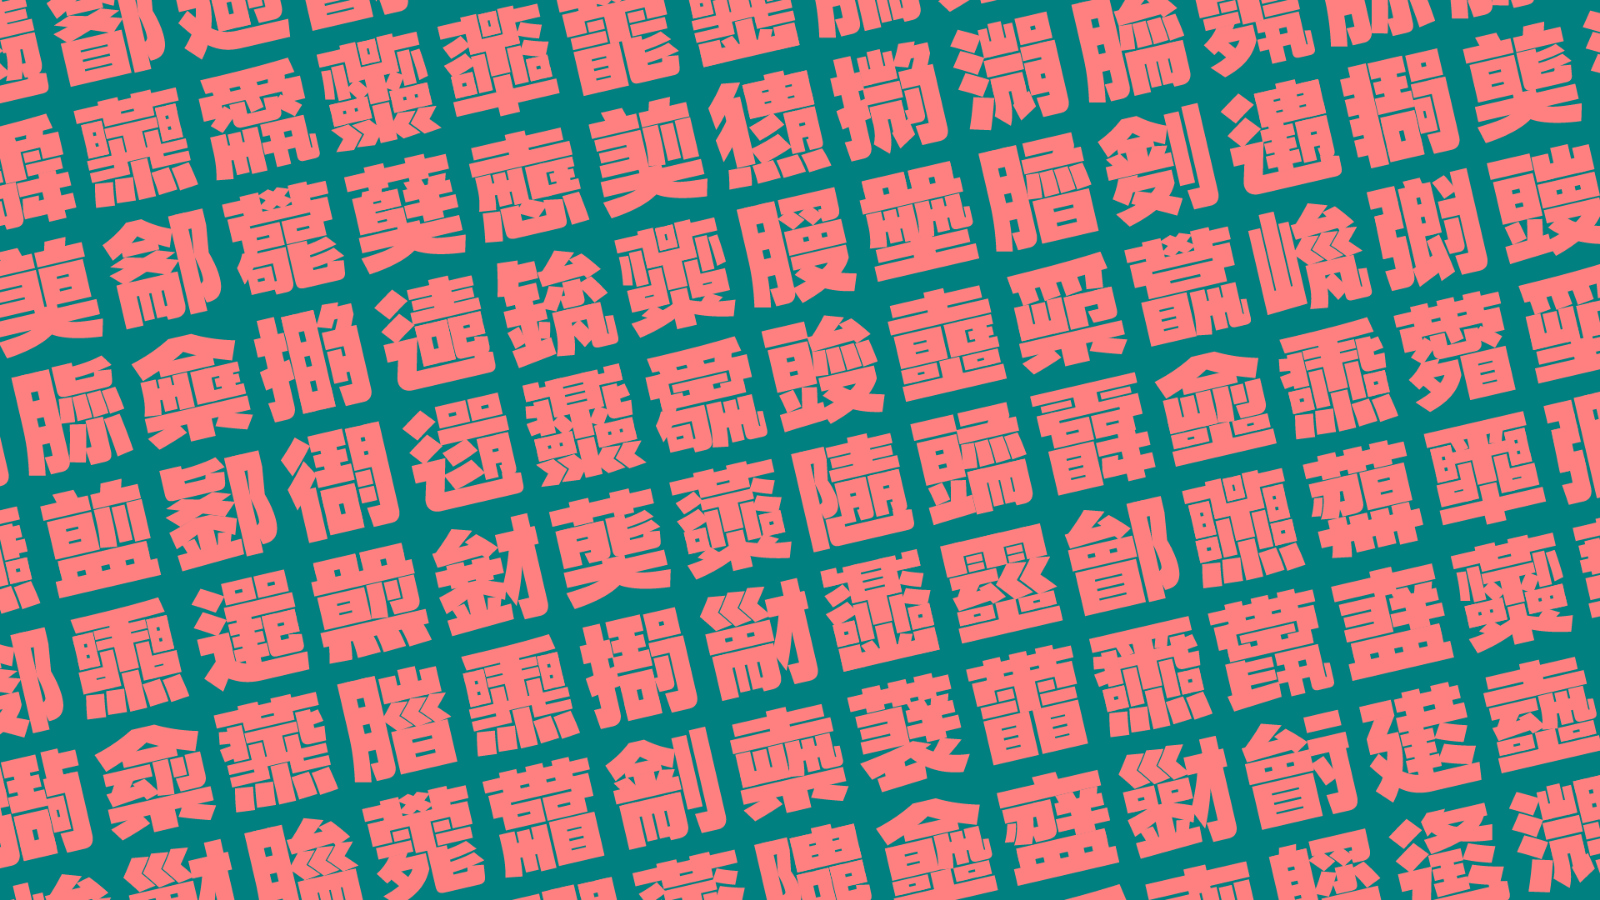 https://ft-bk1.oss-cn-zhangjiakou.aliyuncs.com/Public/Uploads/img/n_content_20201210105441_3051.jpg